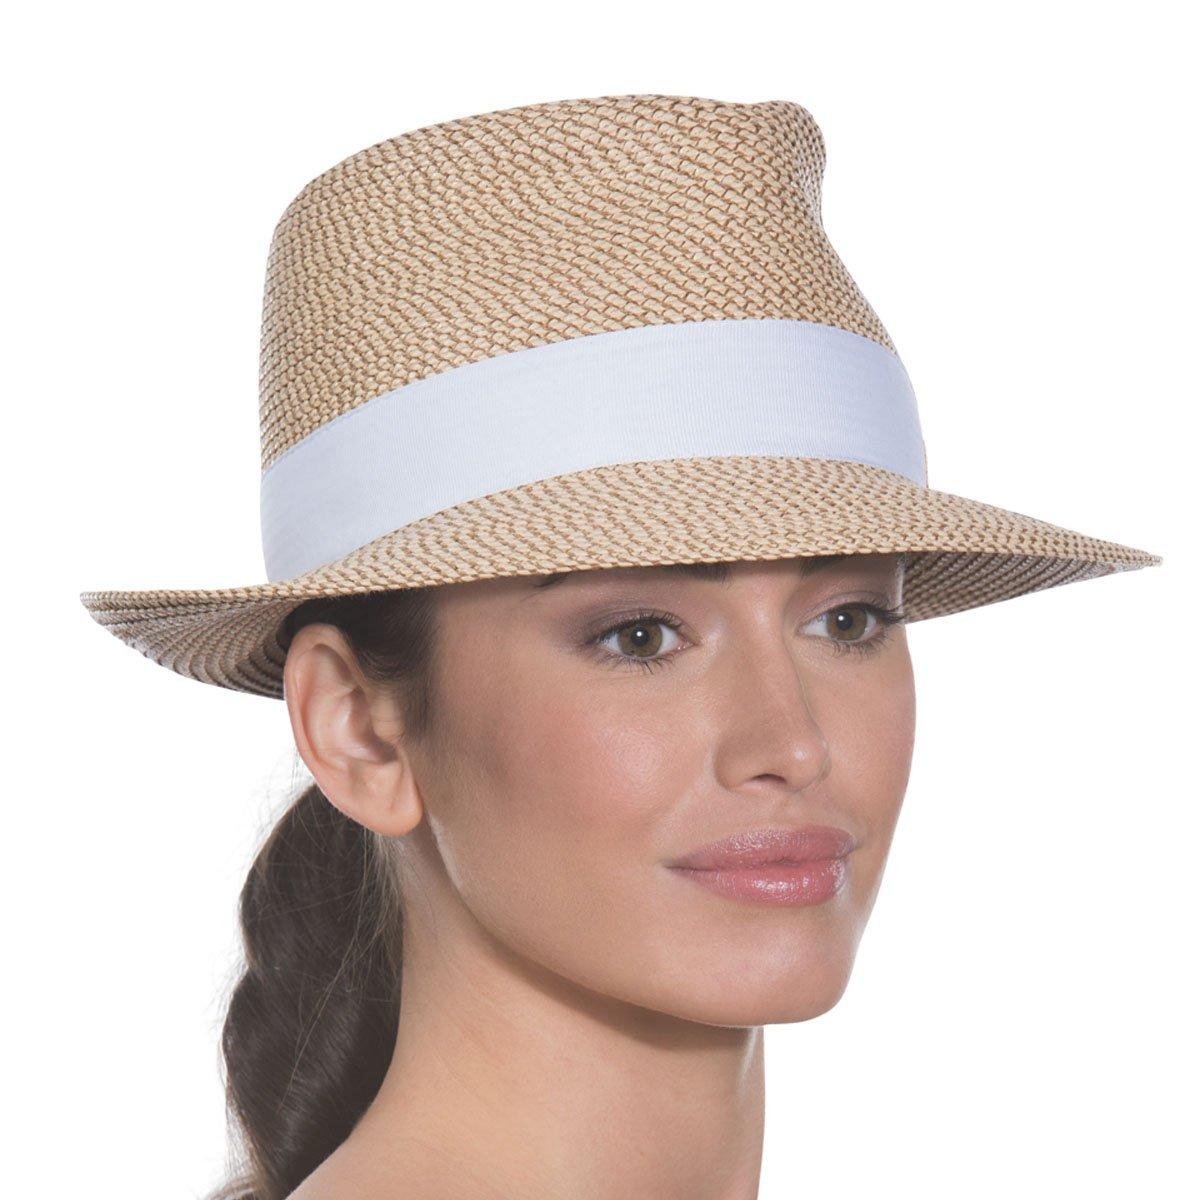 Eric Javits Luxury Fashion Designer Women's Headwear Hat - Squishee Classic- Peanut/White